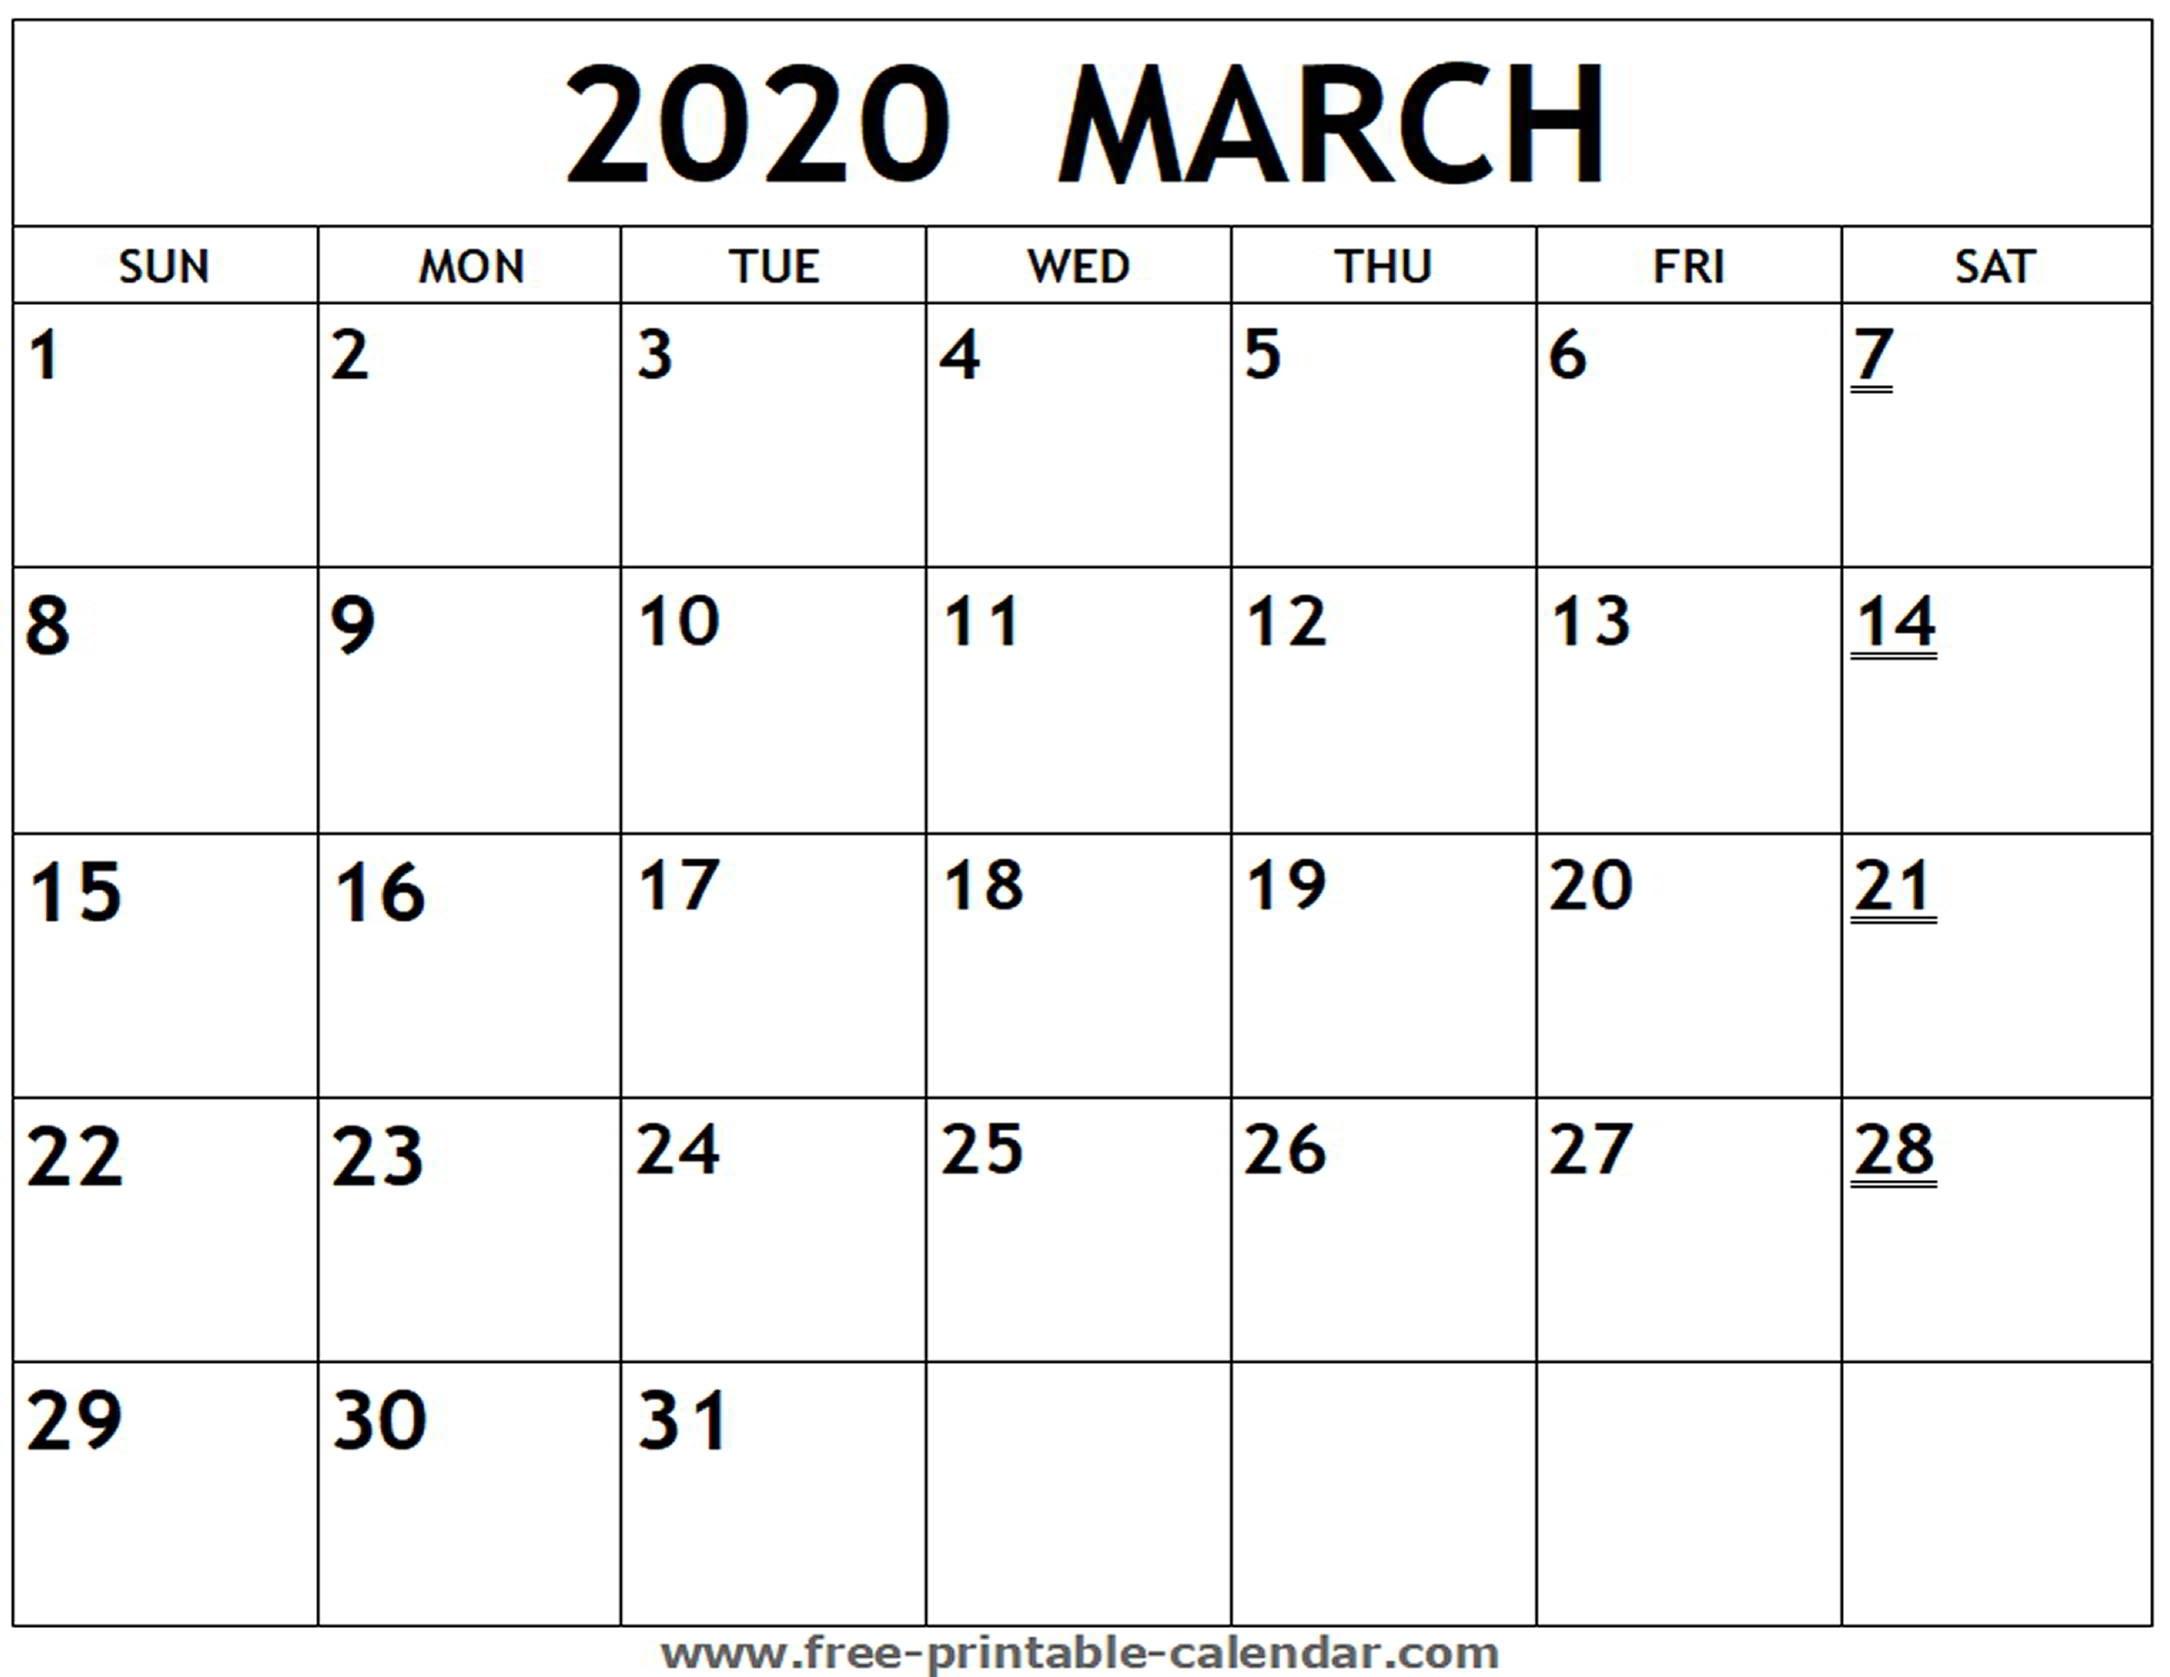 Printable 2020 March Calendar - Free-Printable-Calendar